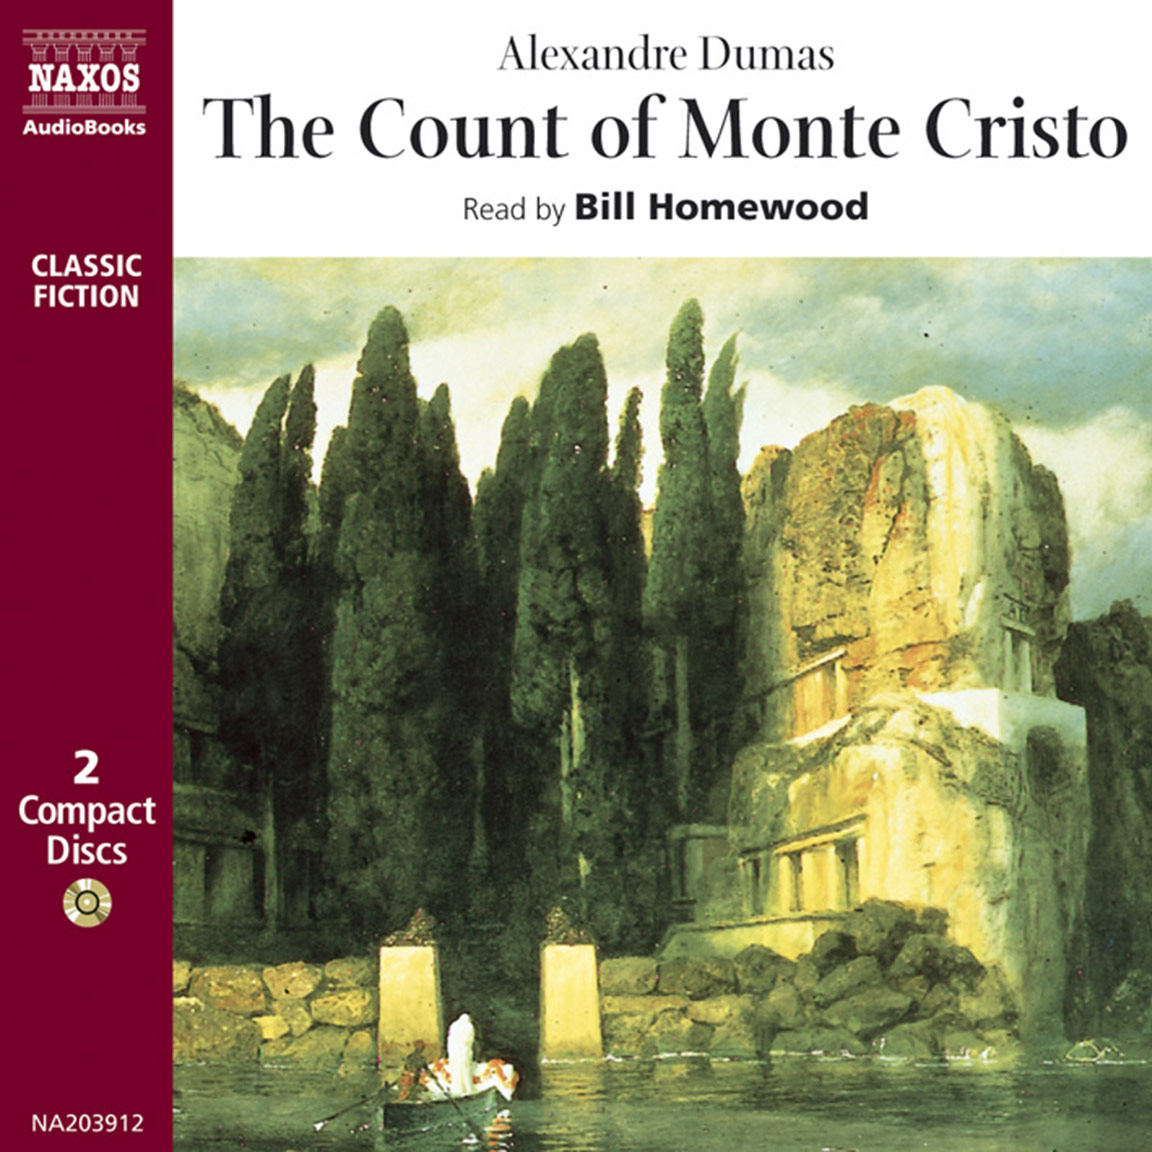 Count of Monte Cristo, The (unabridged) – Naxos AudioBooks